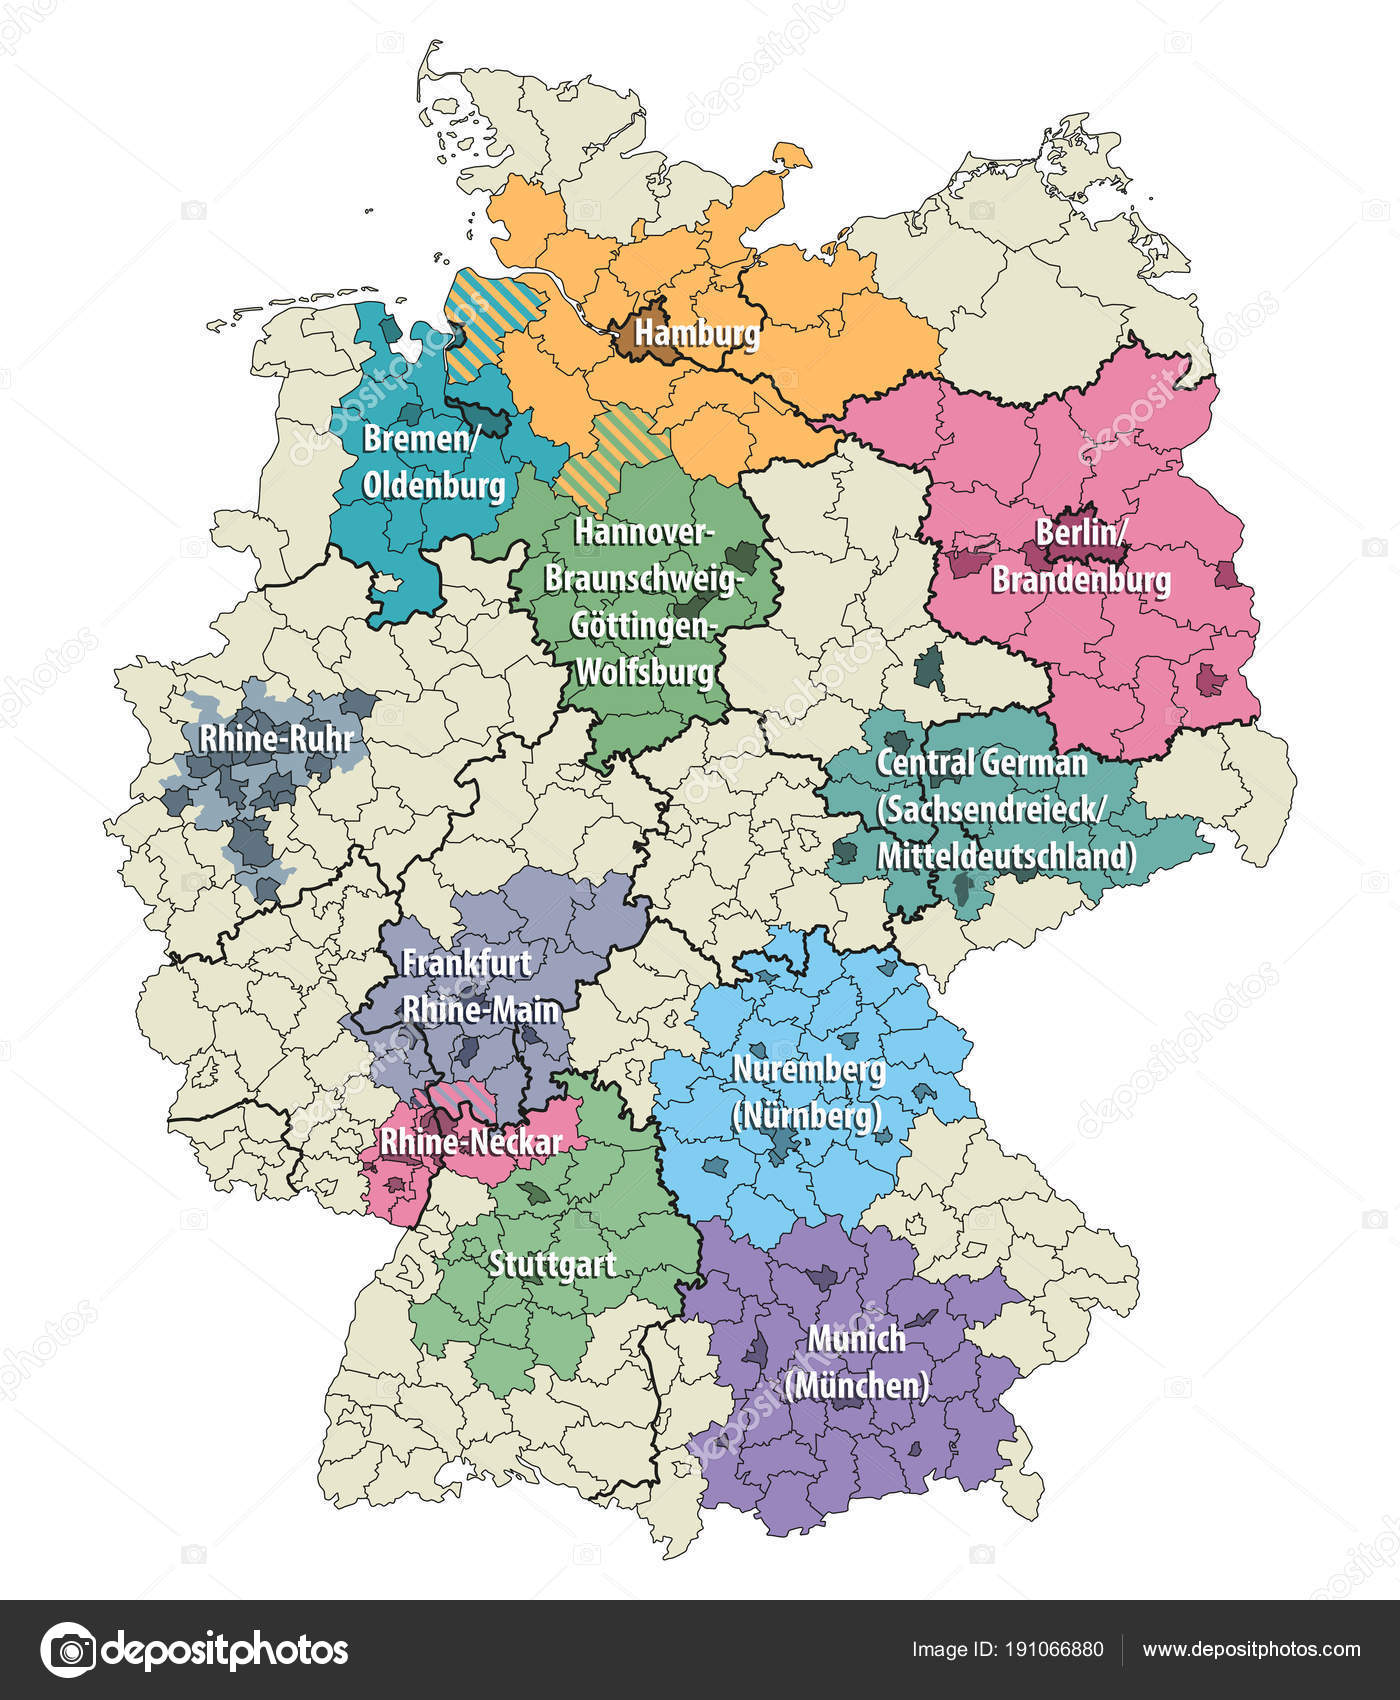 Regions Of Germany Map.Germany Metropolitan Regions Vector Map Stock Vector C Jktu 21